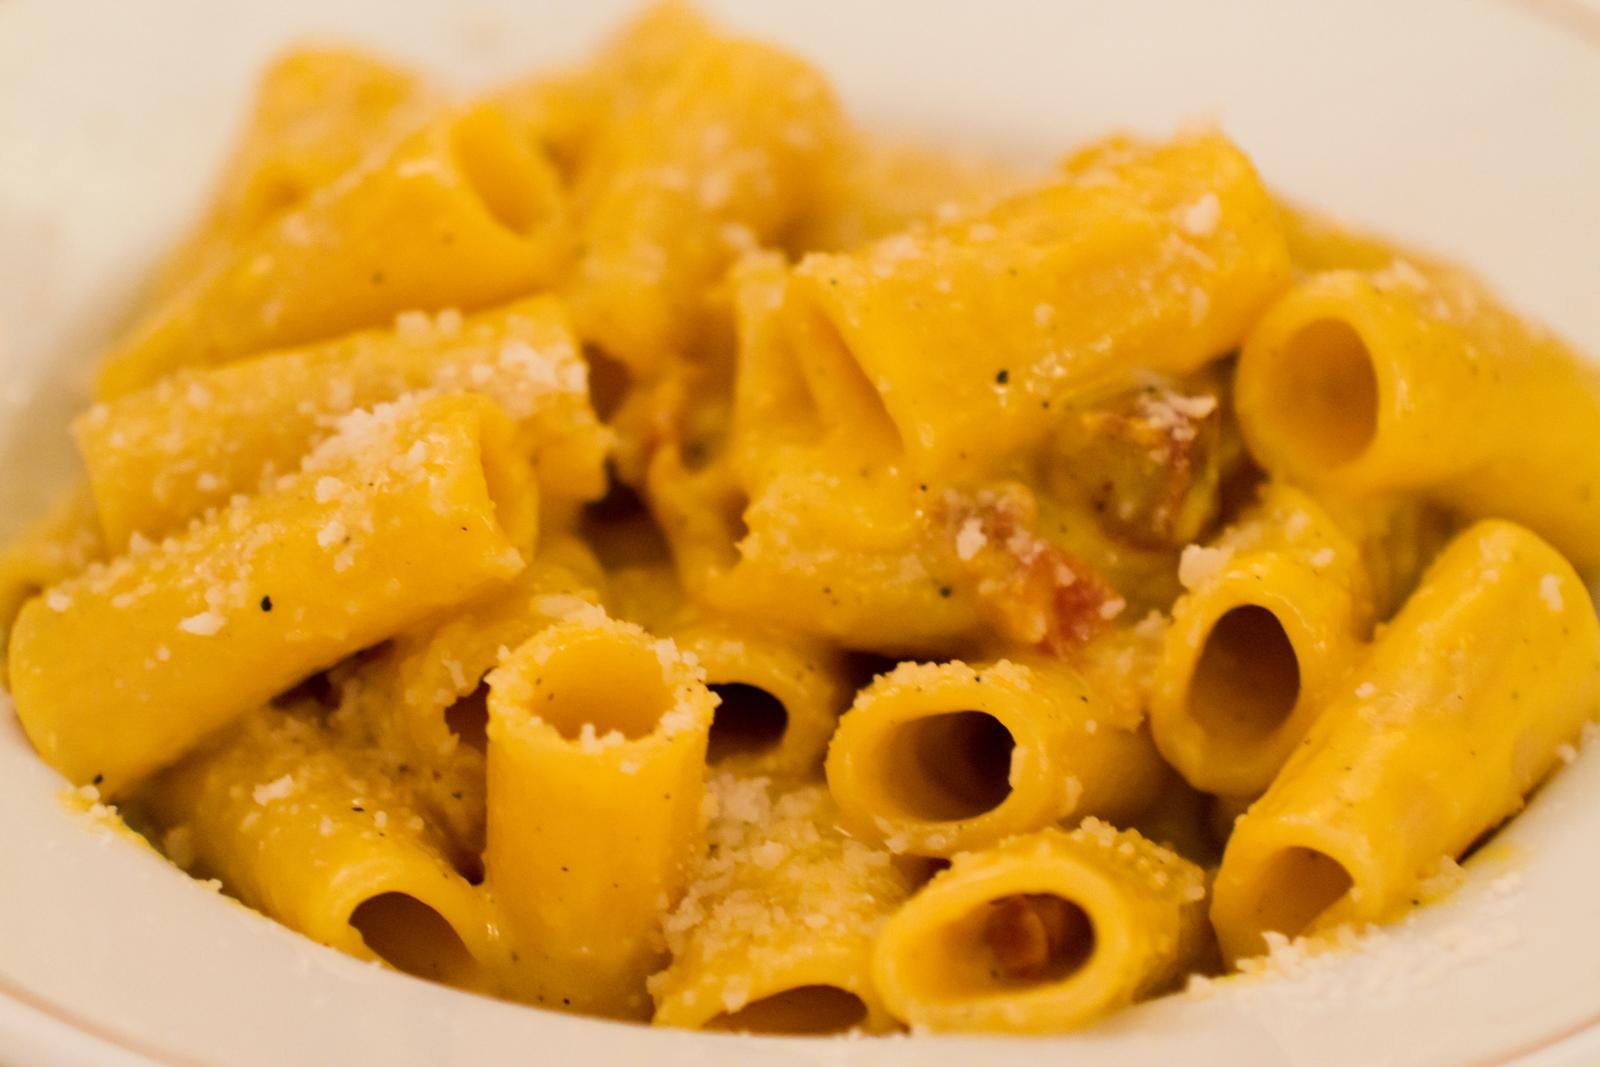 Roman Cuisine | August in Rome for Foodies | BrowsingItaly.com